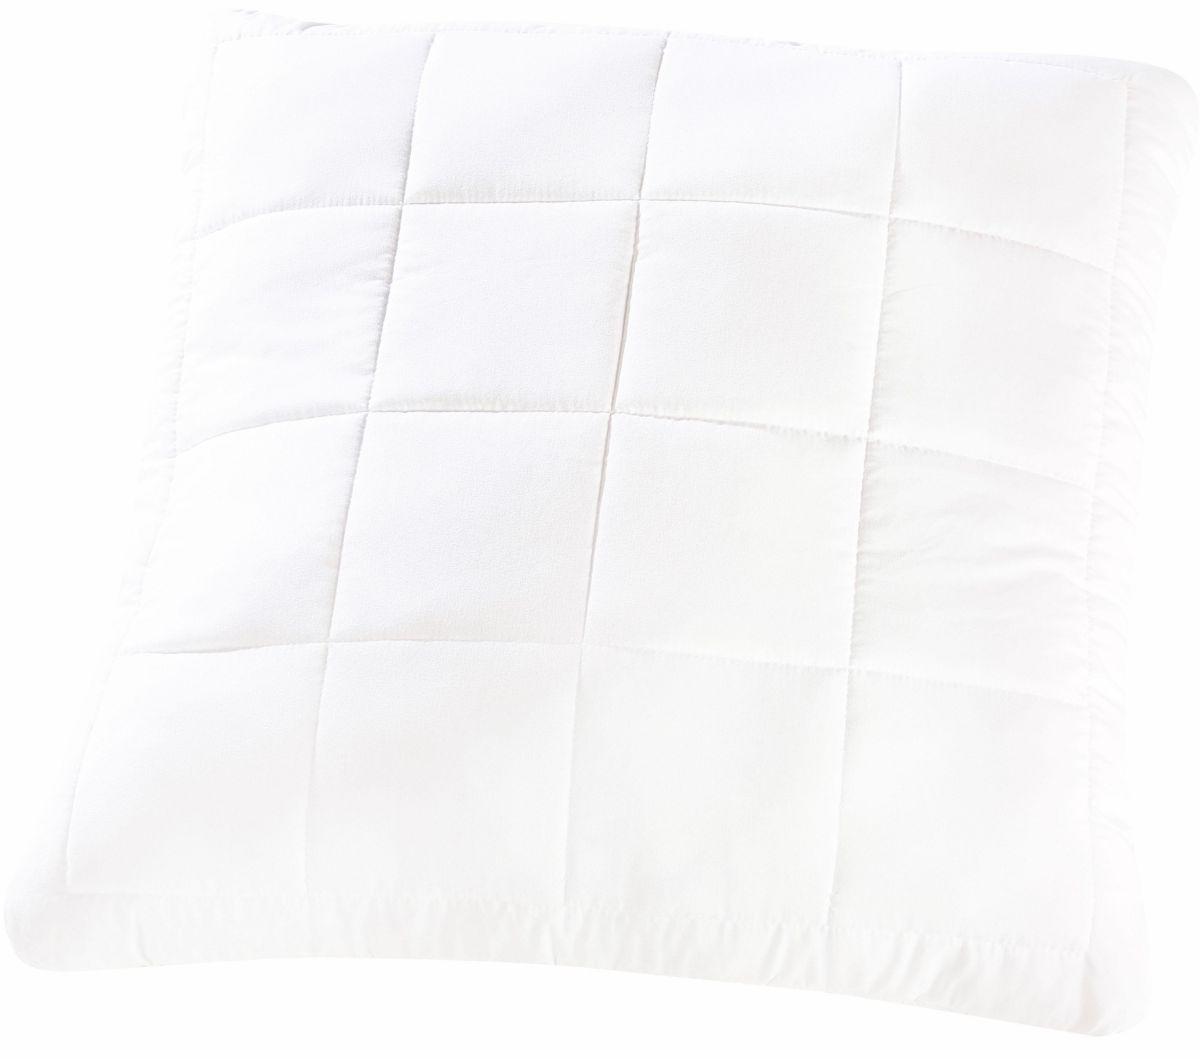 Microfaserkopfkissen Thermaxx Plus Kbt Bettwaren